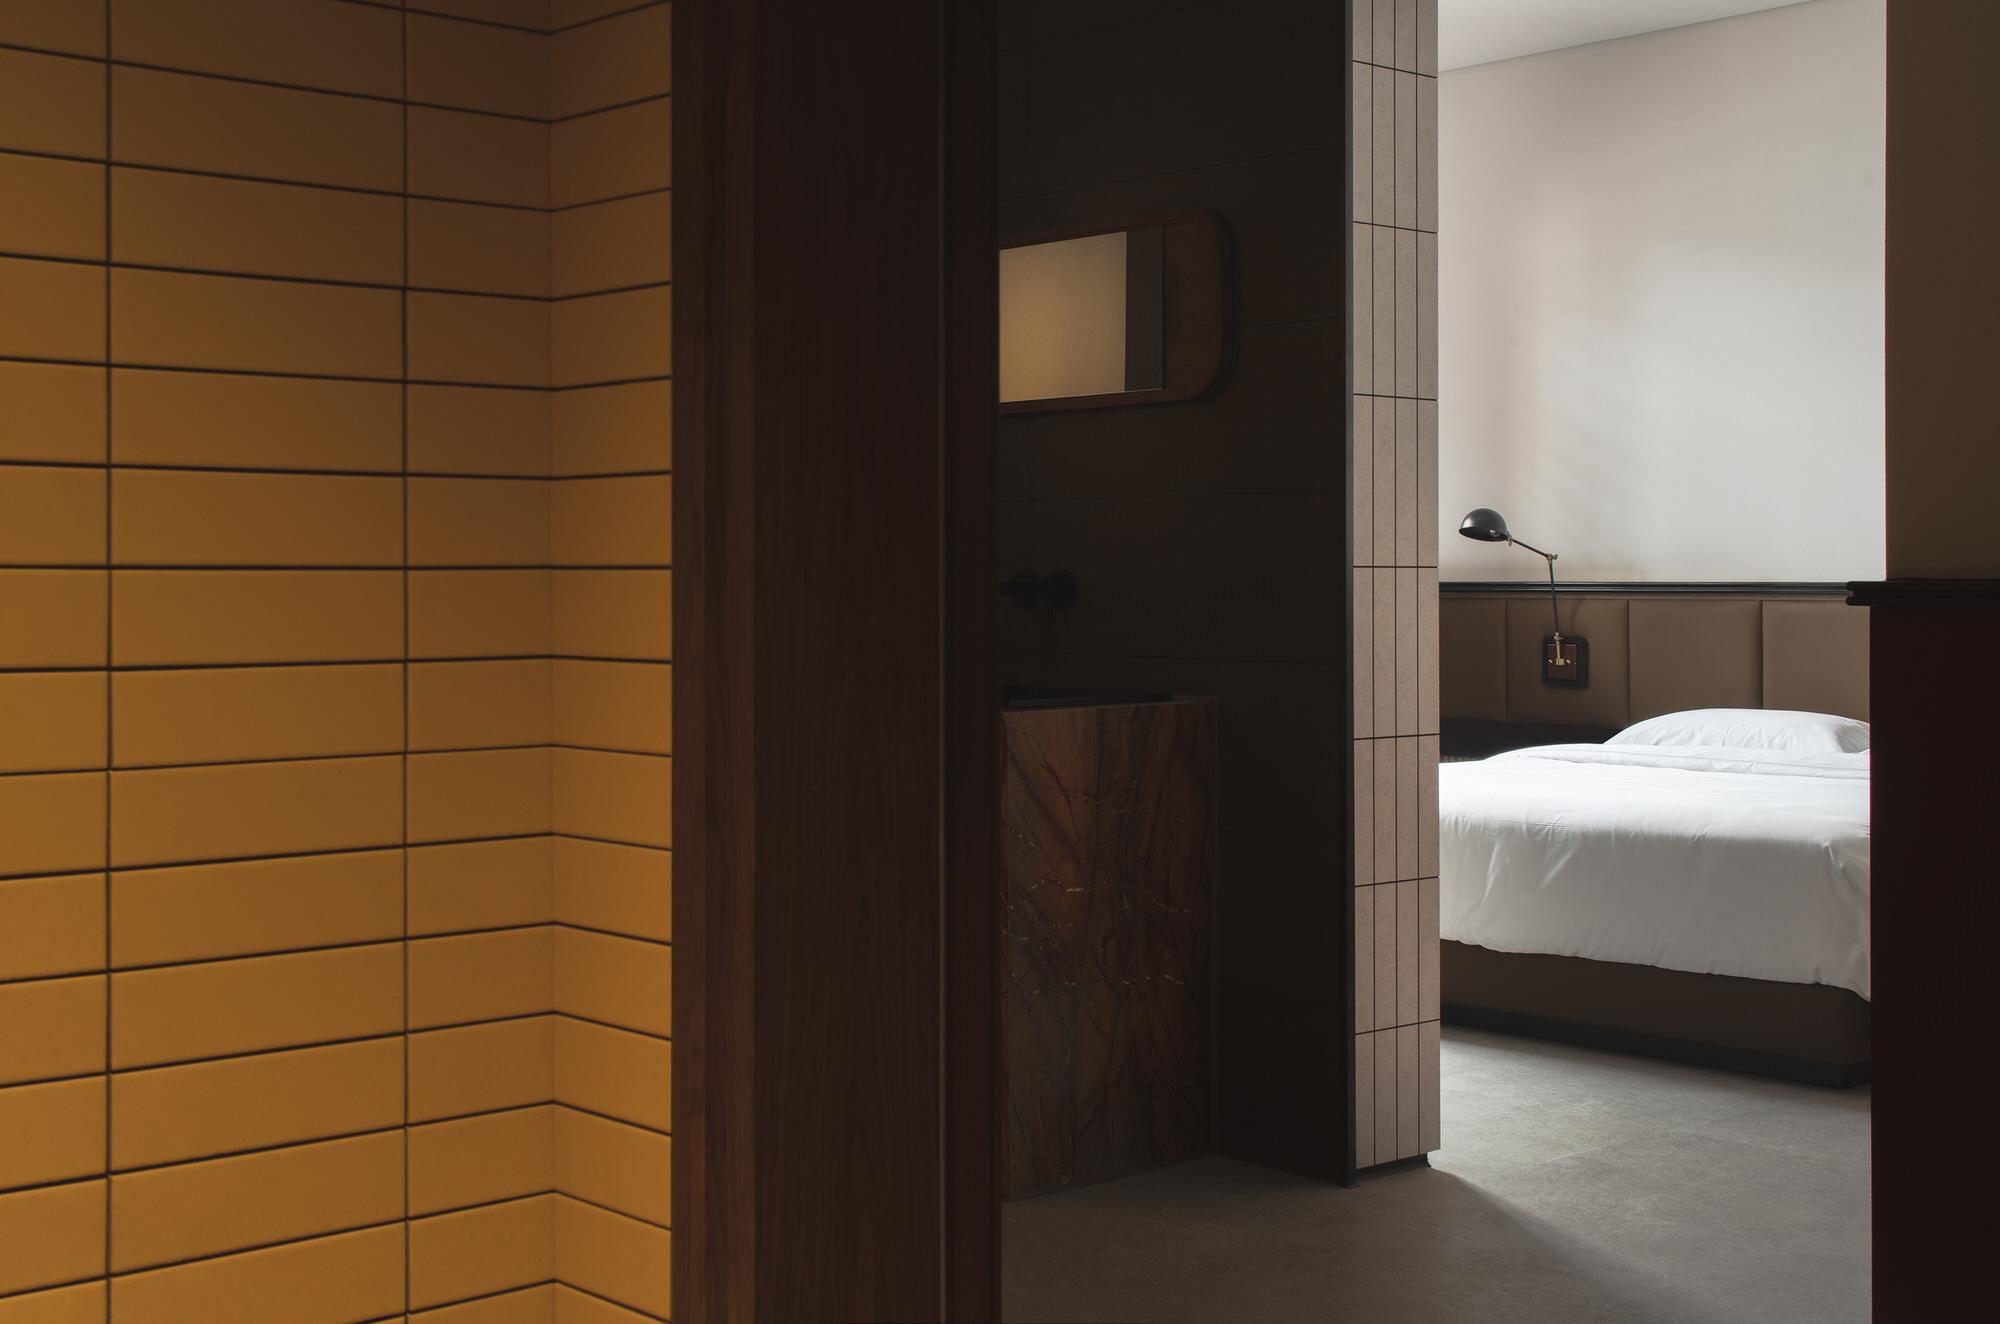 Archetype Design Organization Buda Hotel Chengdu Photo Here Space Yellowtrace 10